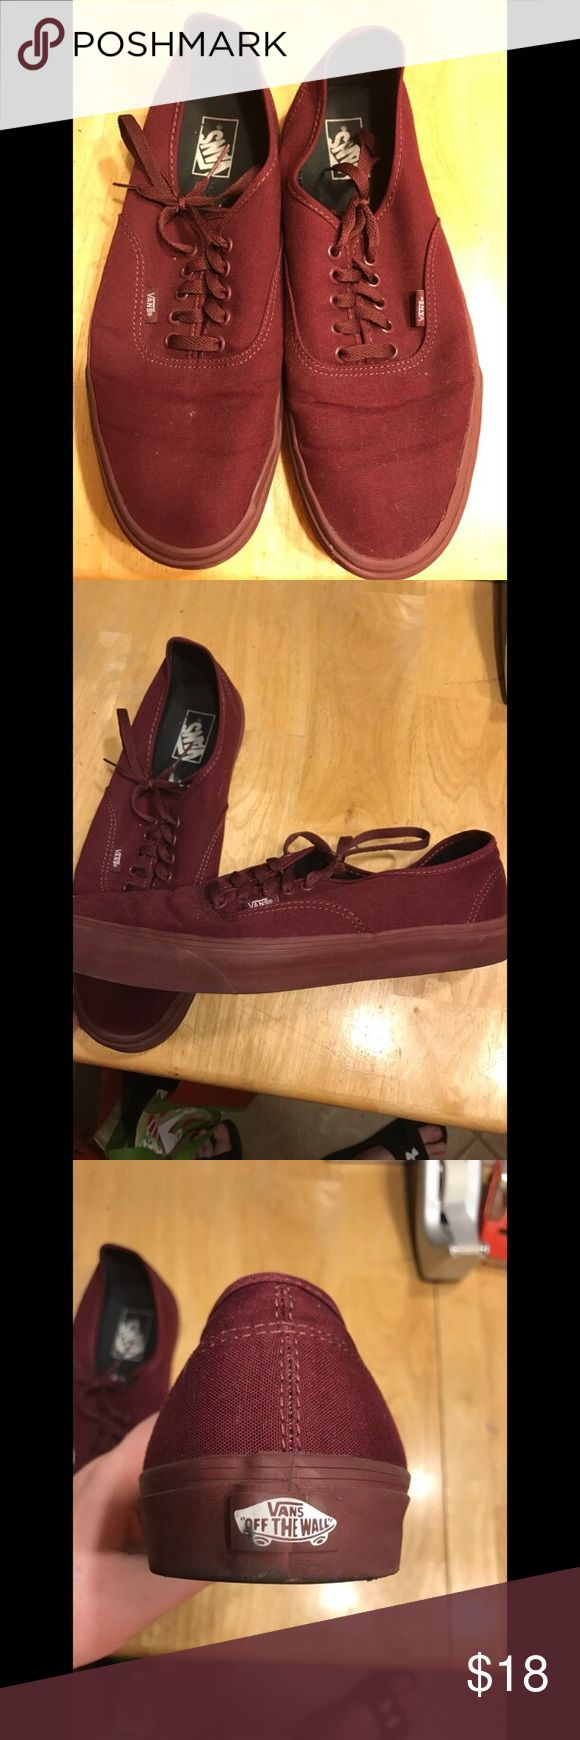 Maroon Vans Shoes Used! In good condition! Vans! Maroon! Shoes